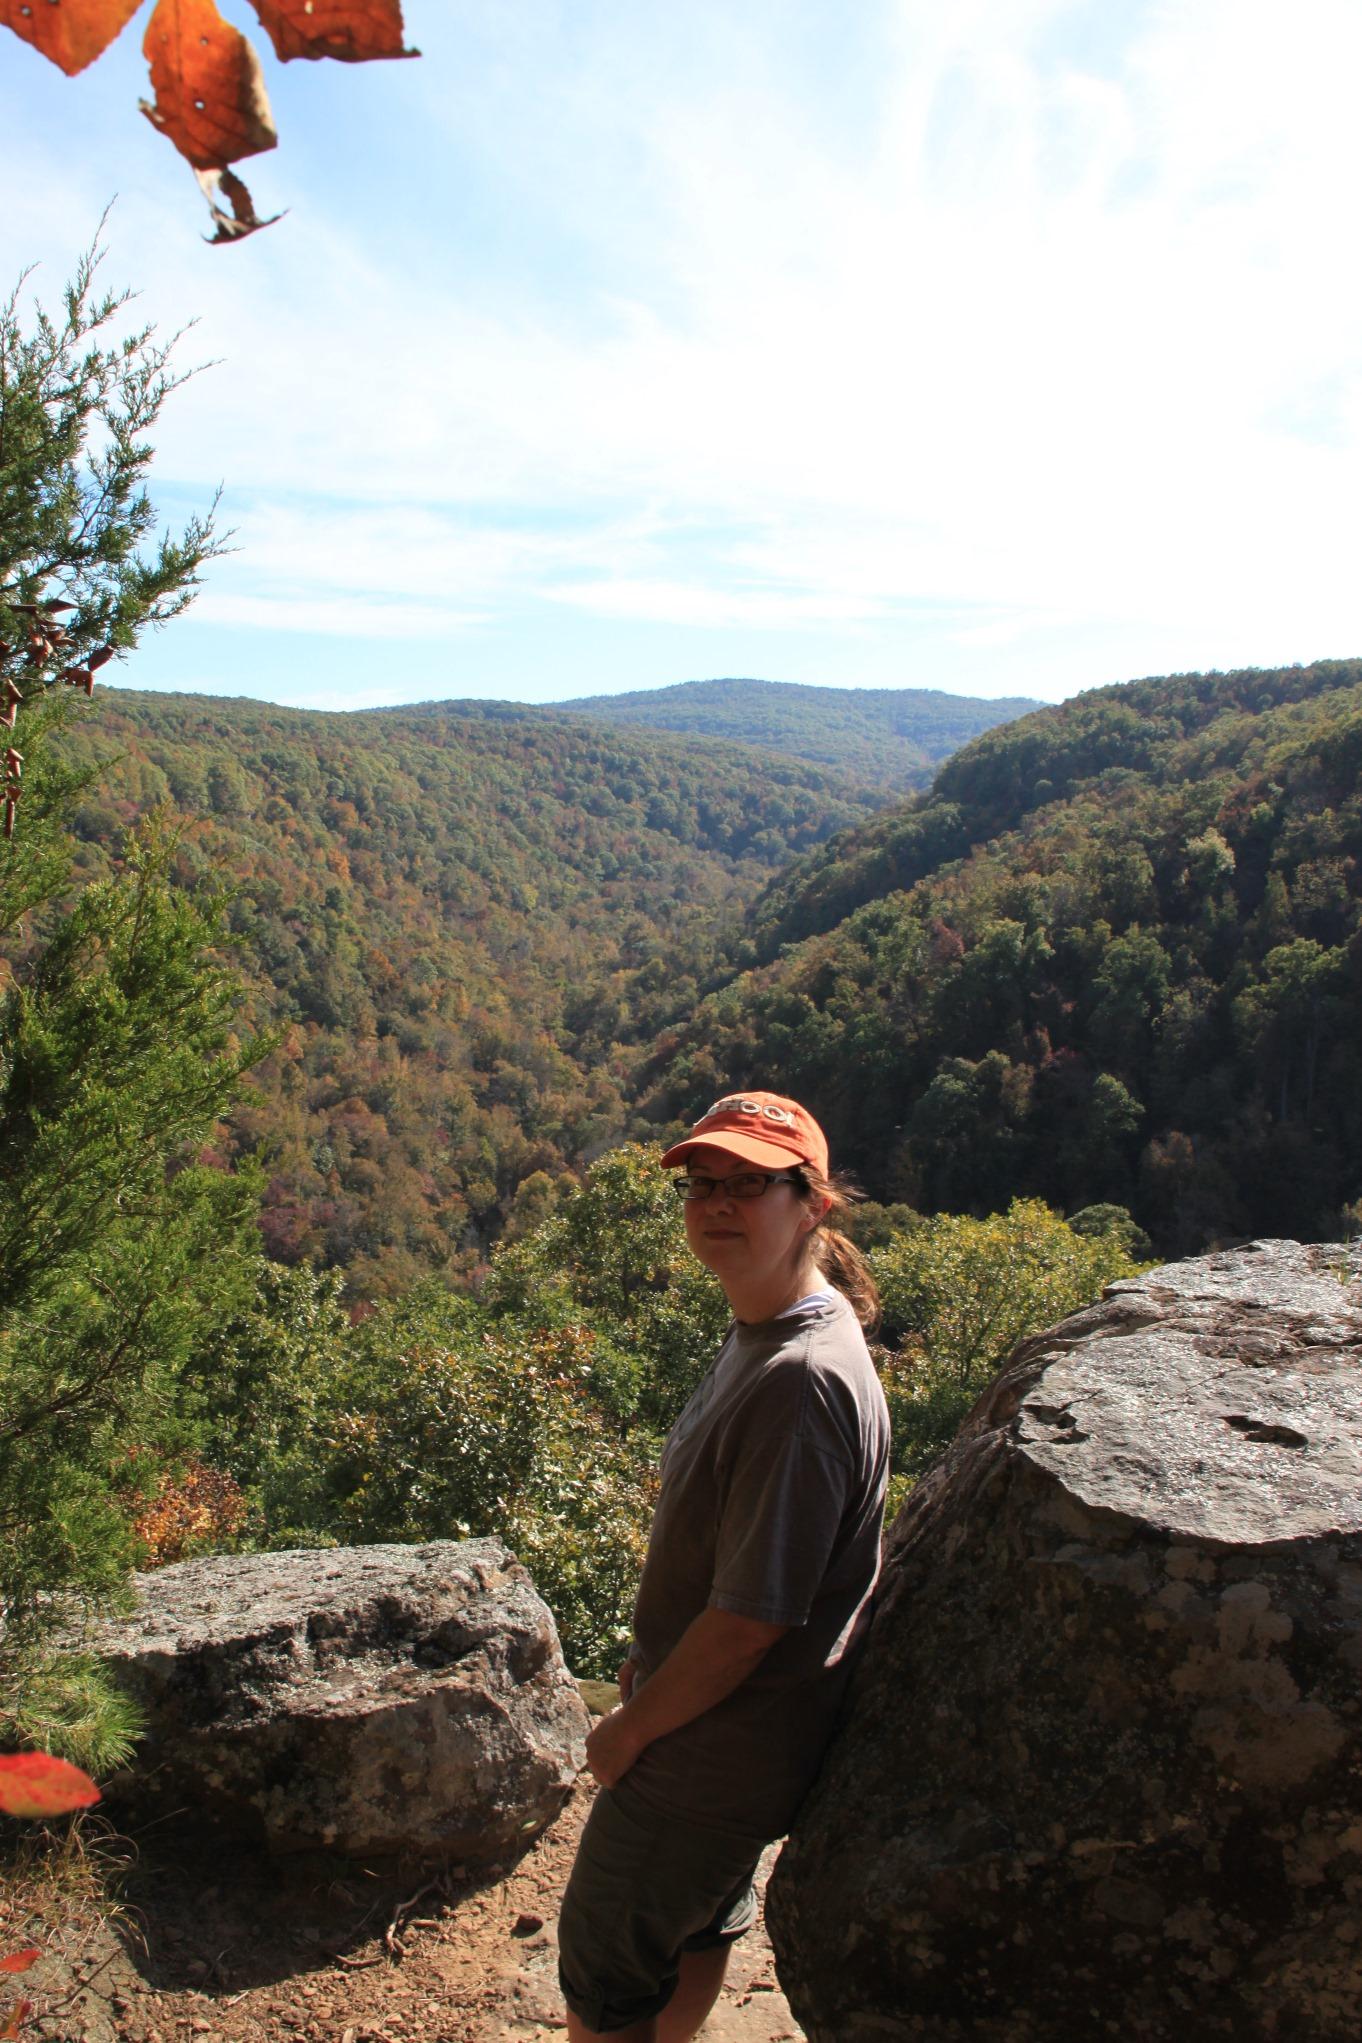 Hawksbill Crag Whitaker Point Trail Ozark Forest 3 mi ob